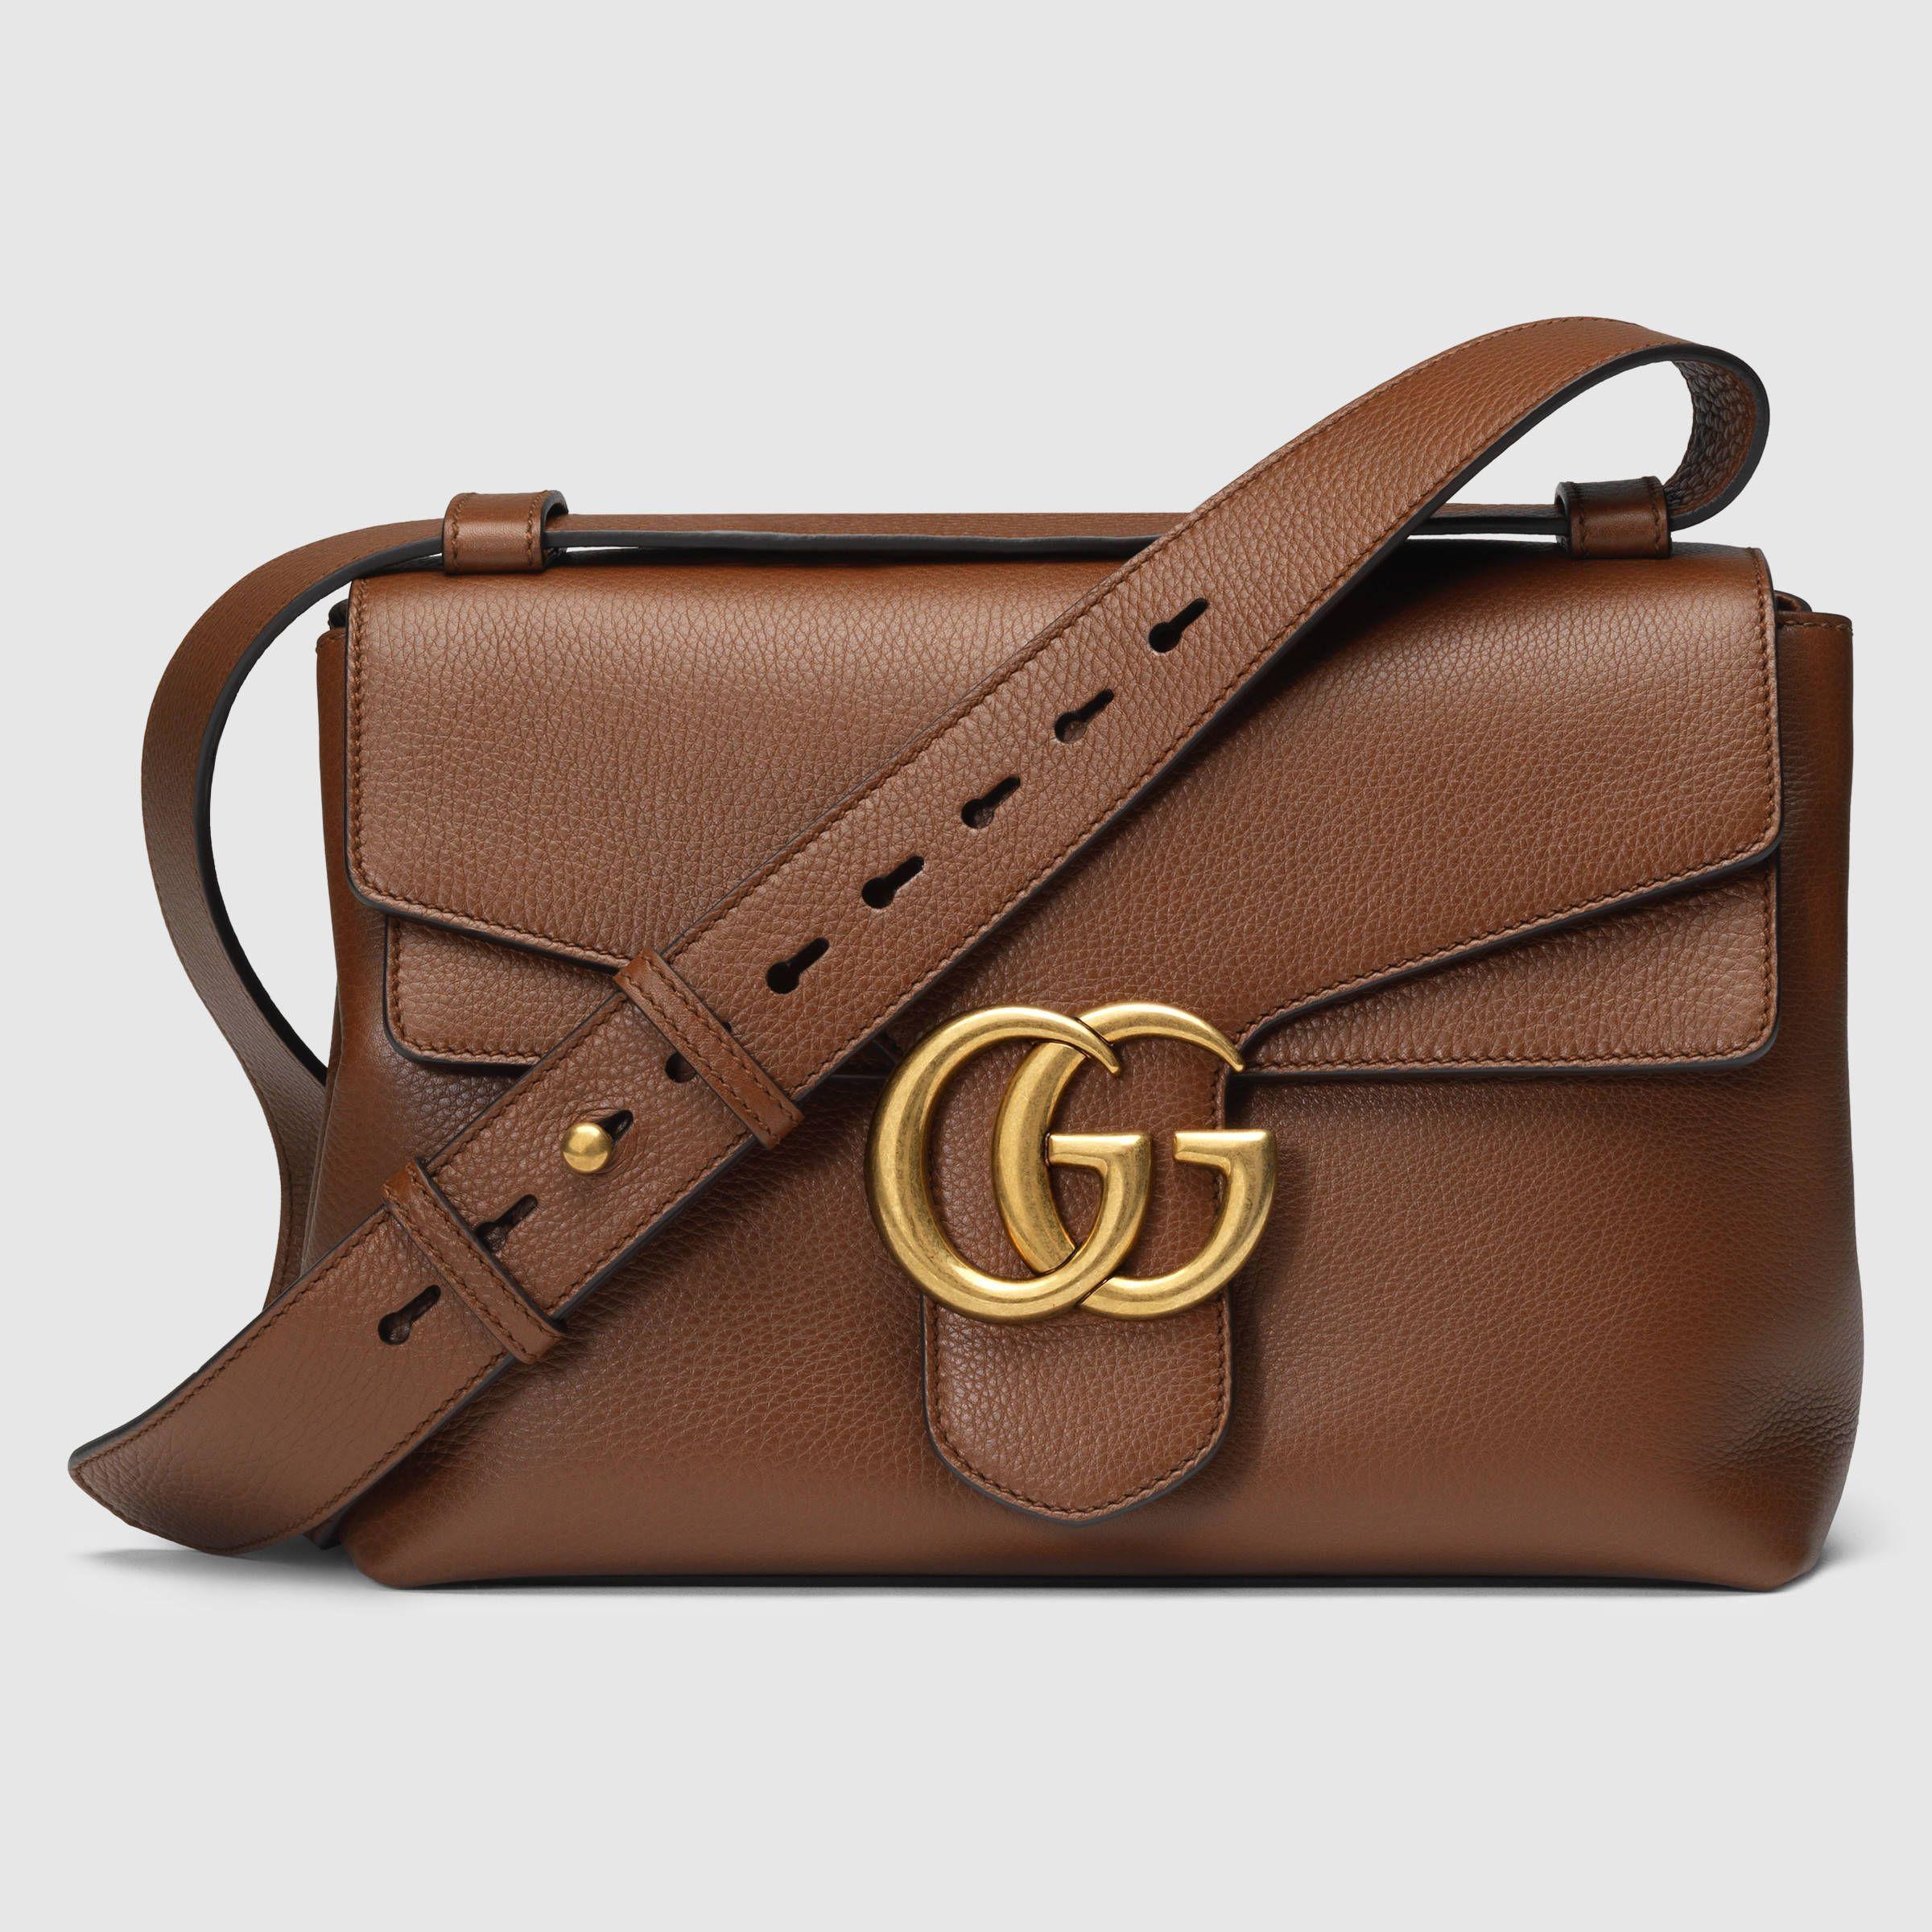 Gucci Women - GG Marmont leather shoulder bag - 401173A7M0T2548 ... f0c5fbdd2